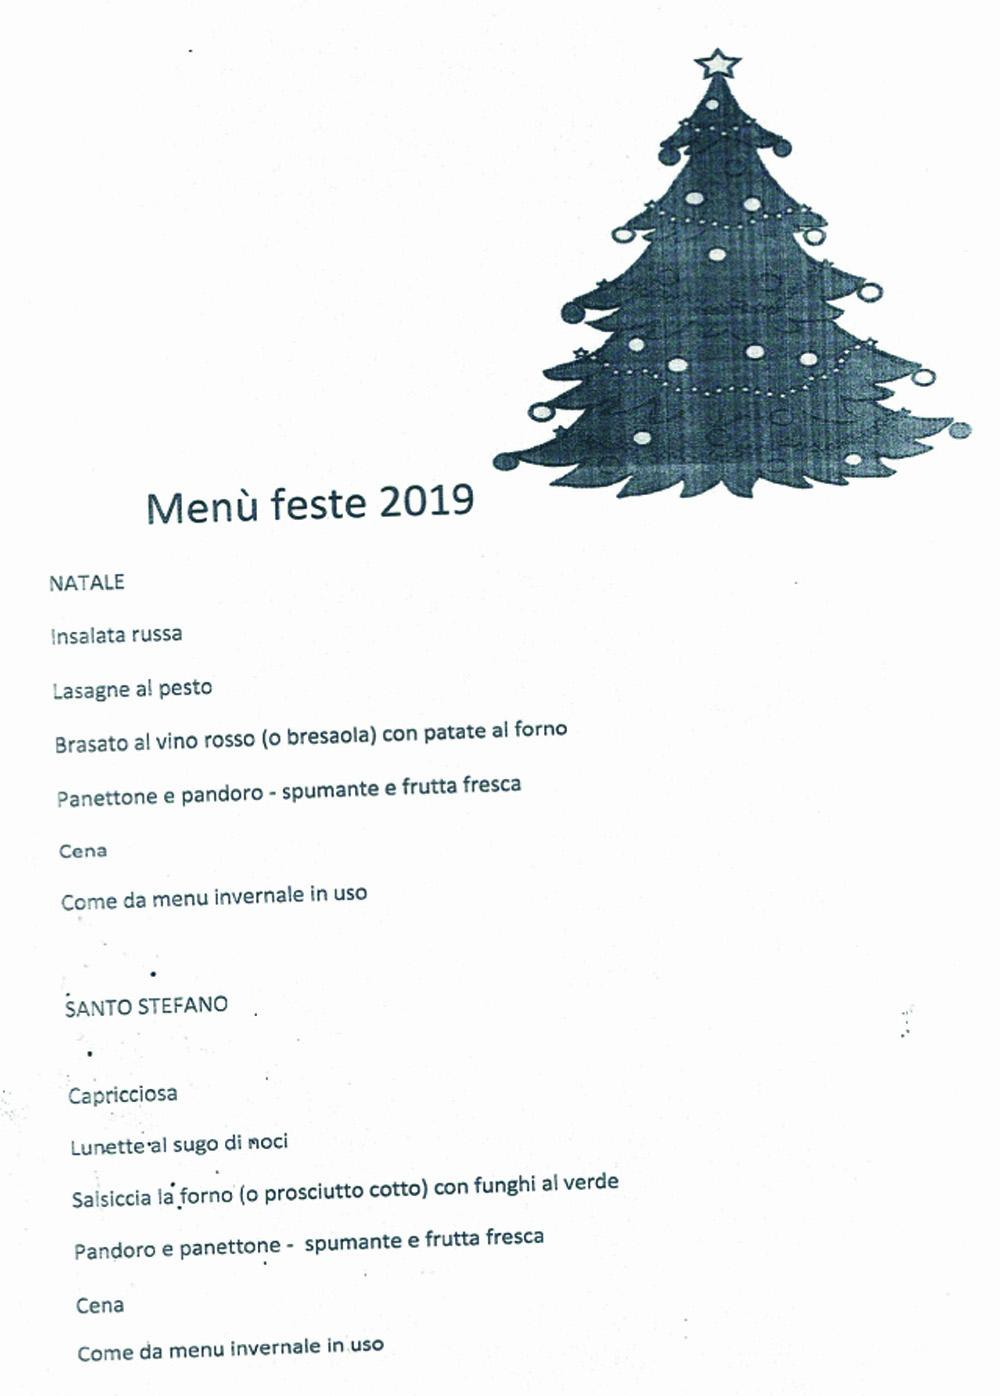 Menu Feste 2019 Residenza Protetta Bagnasco - Opere Sociali Servizi Savona